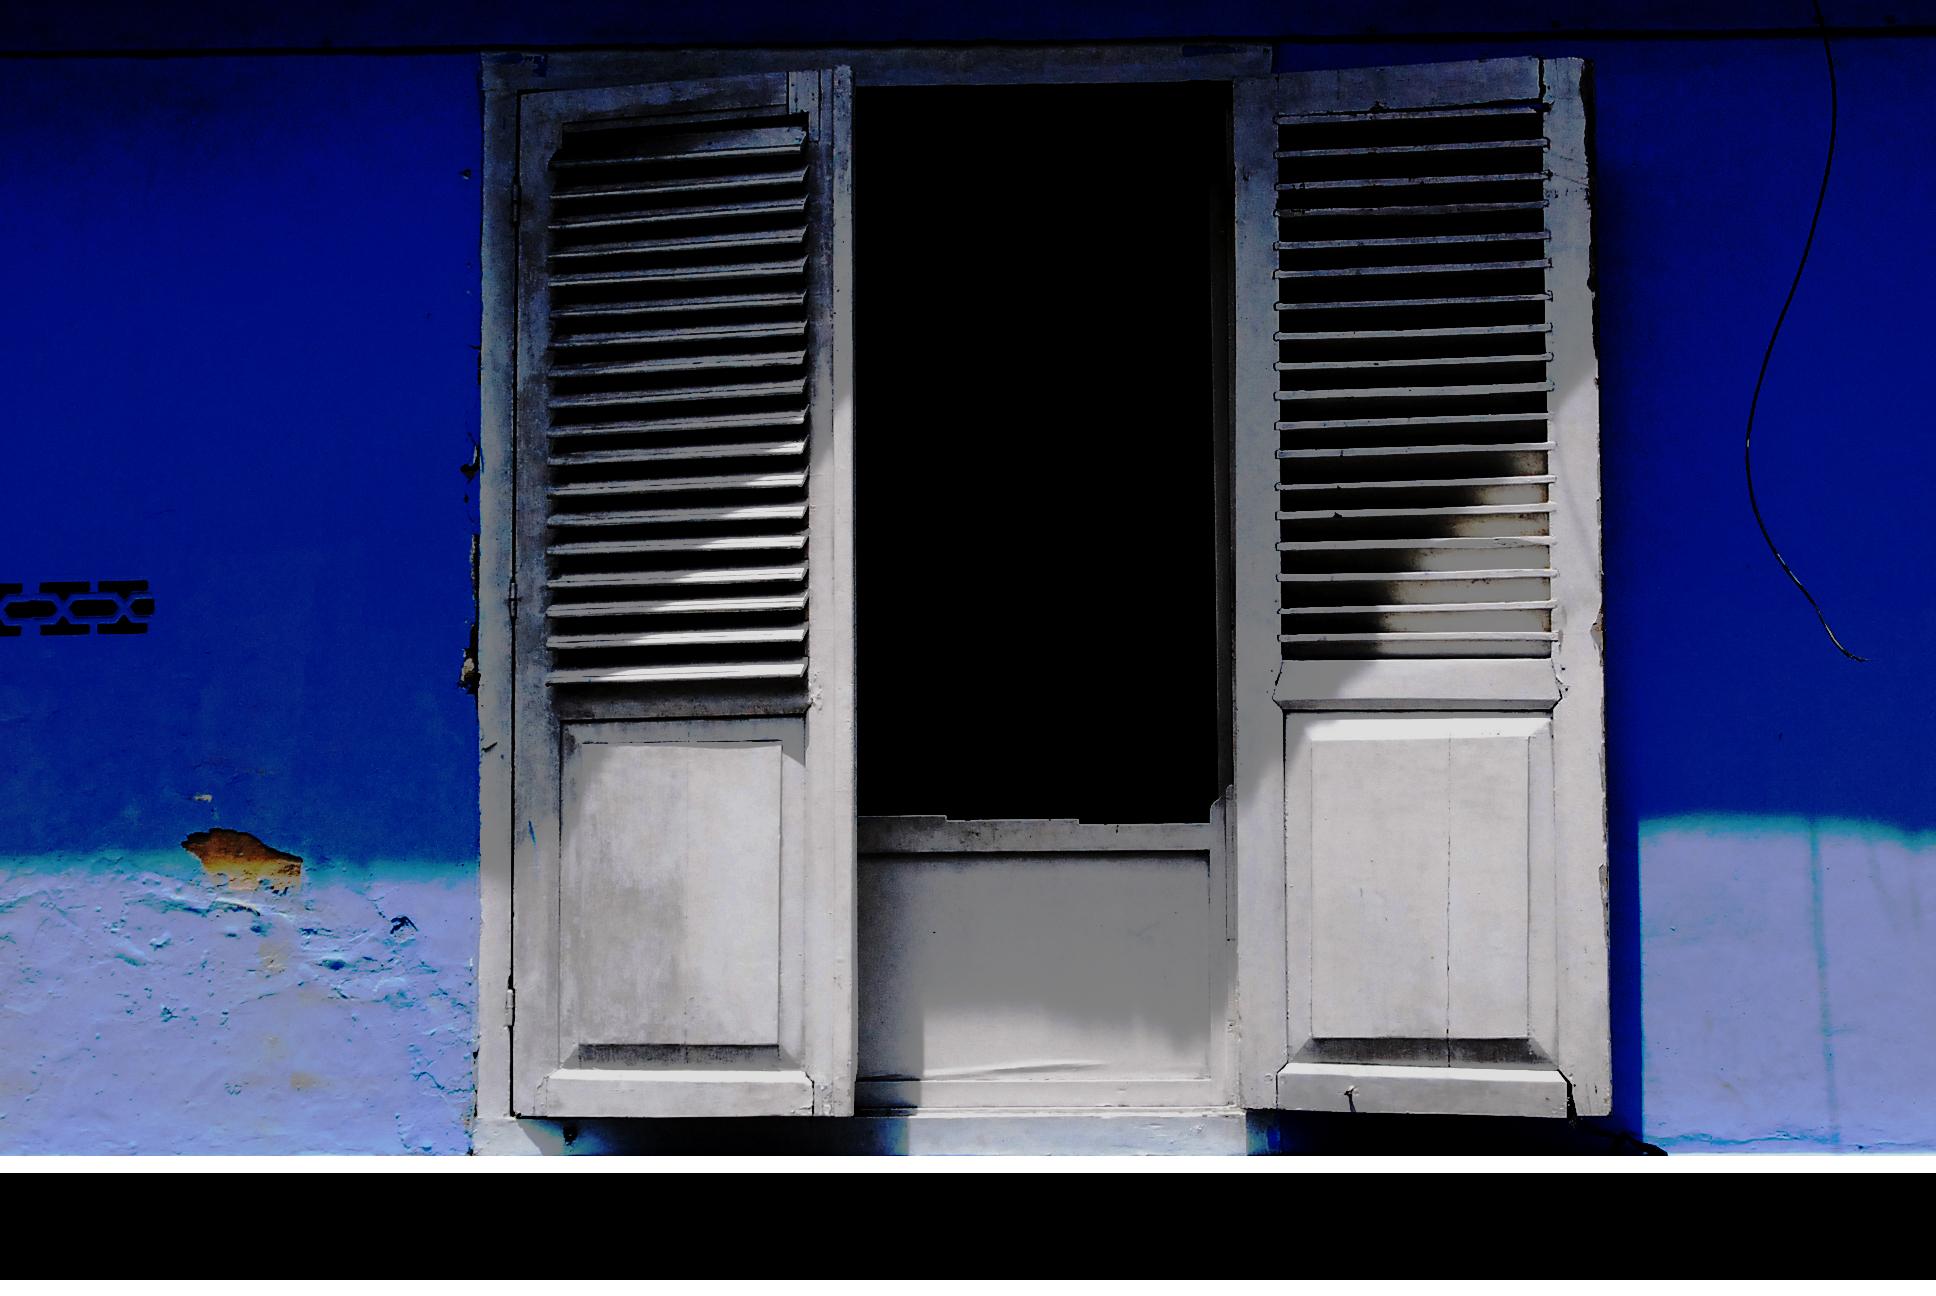 jendela kuno by mbiialone